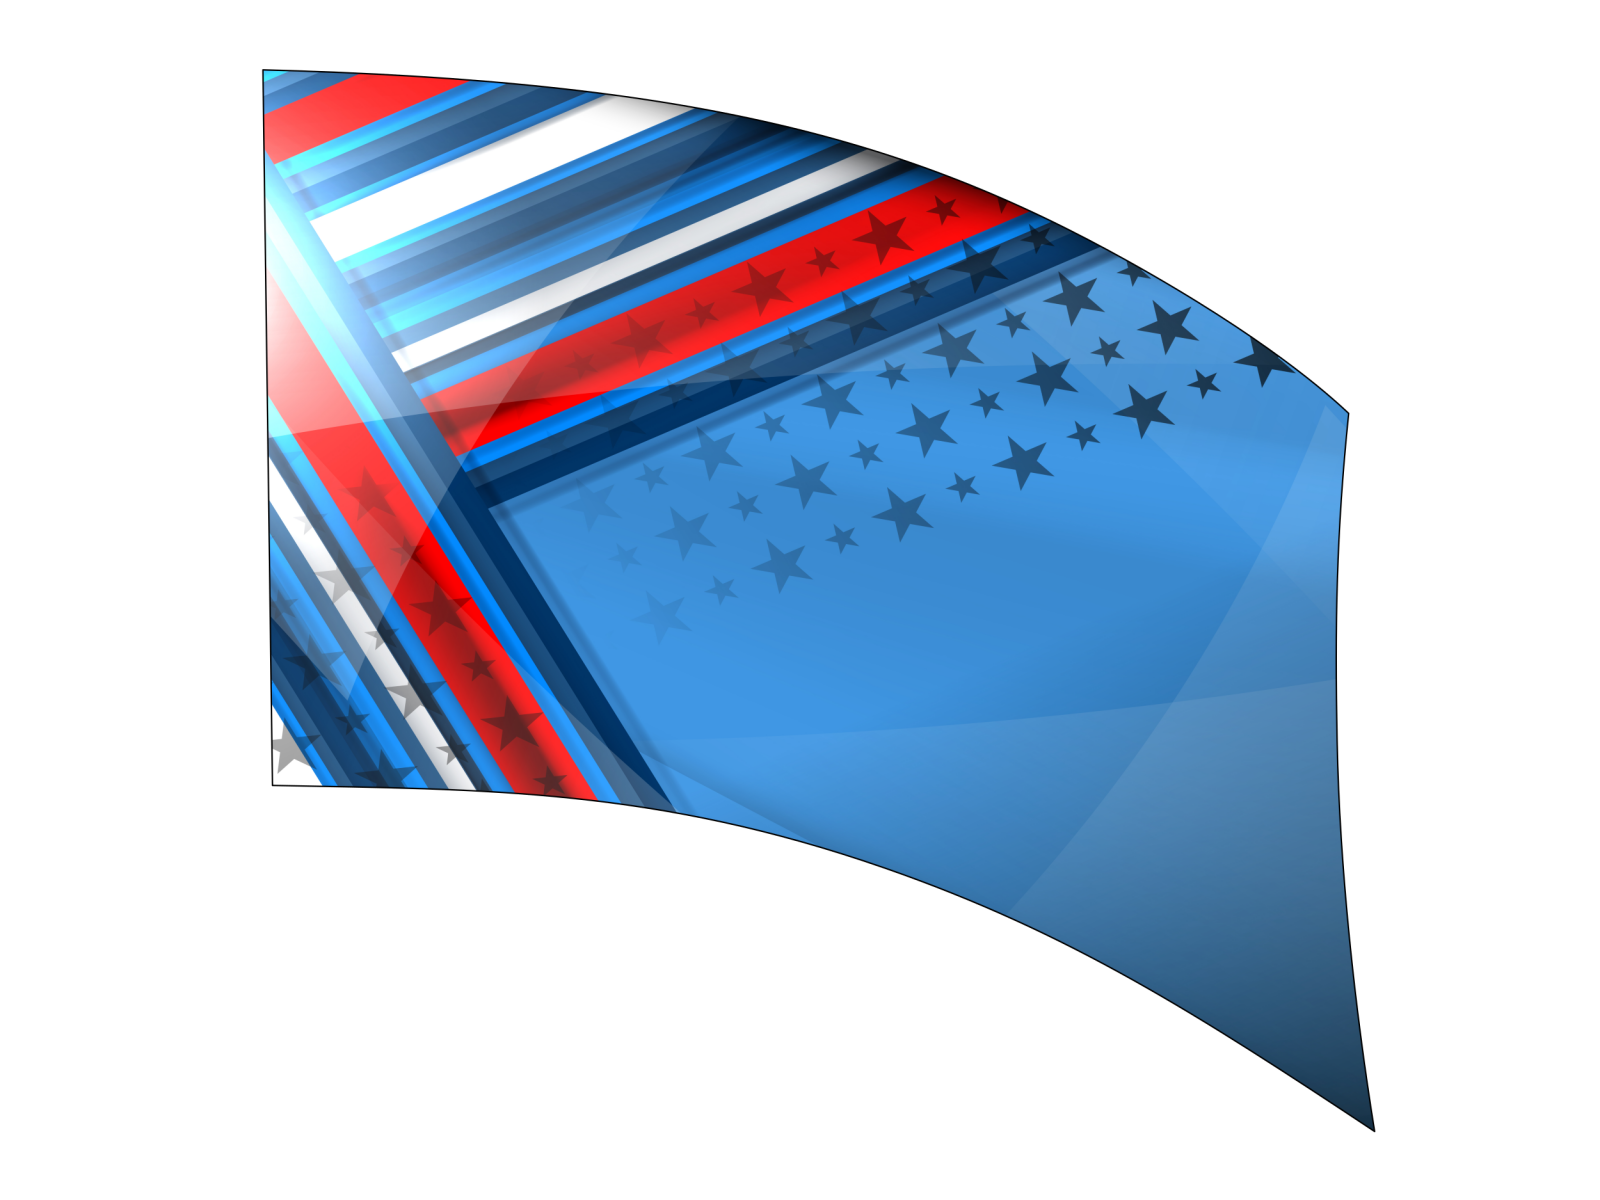 060219s - 36x52 Standard Patriotic 3